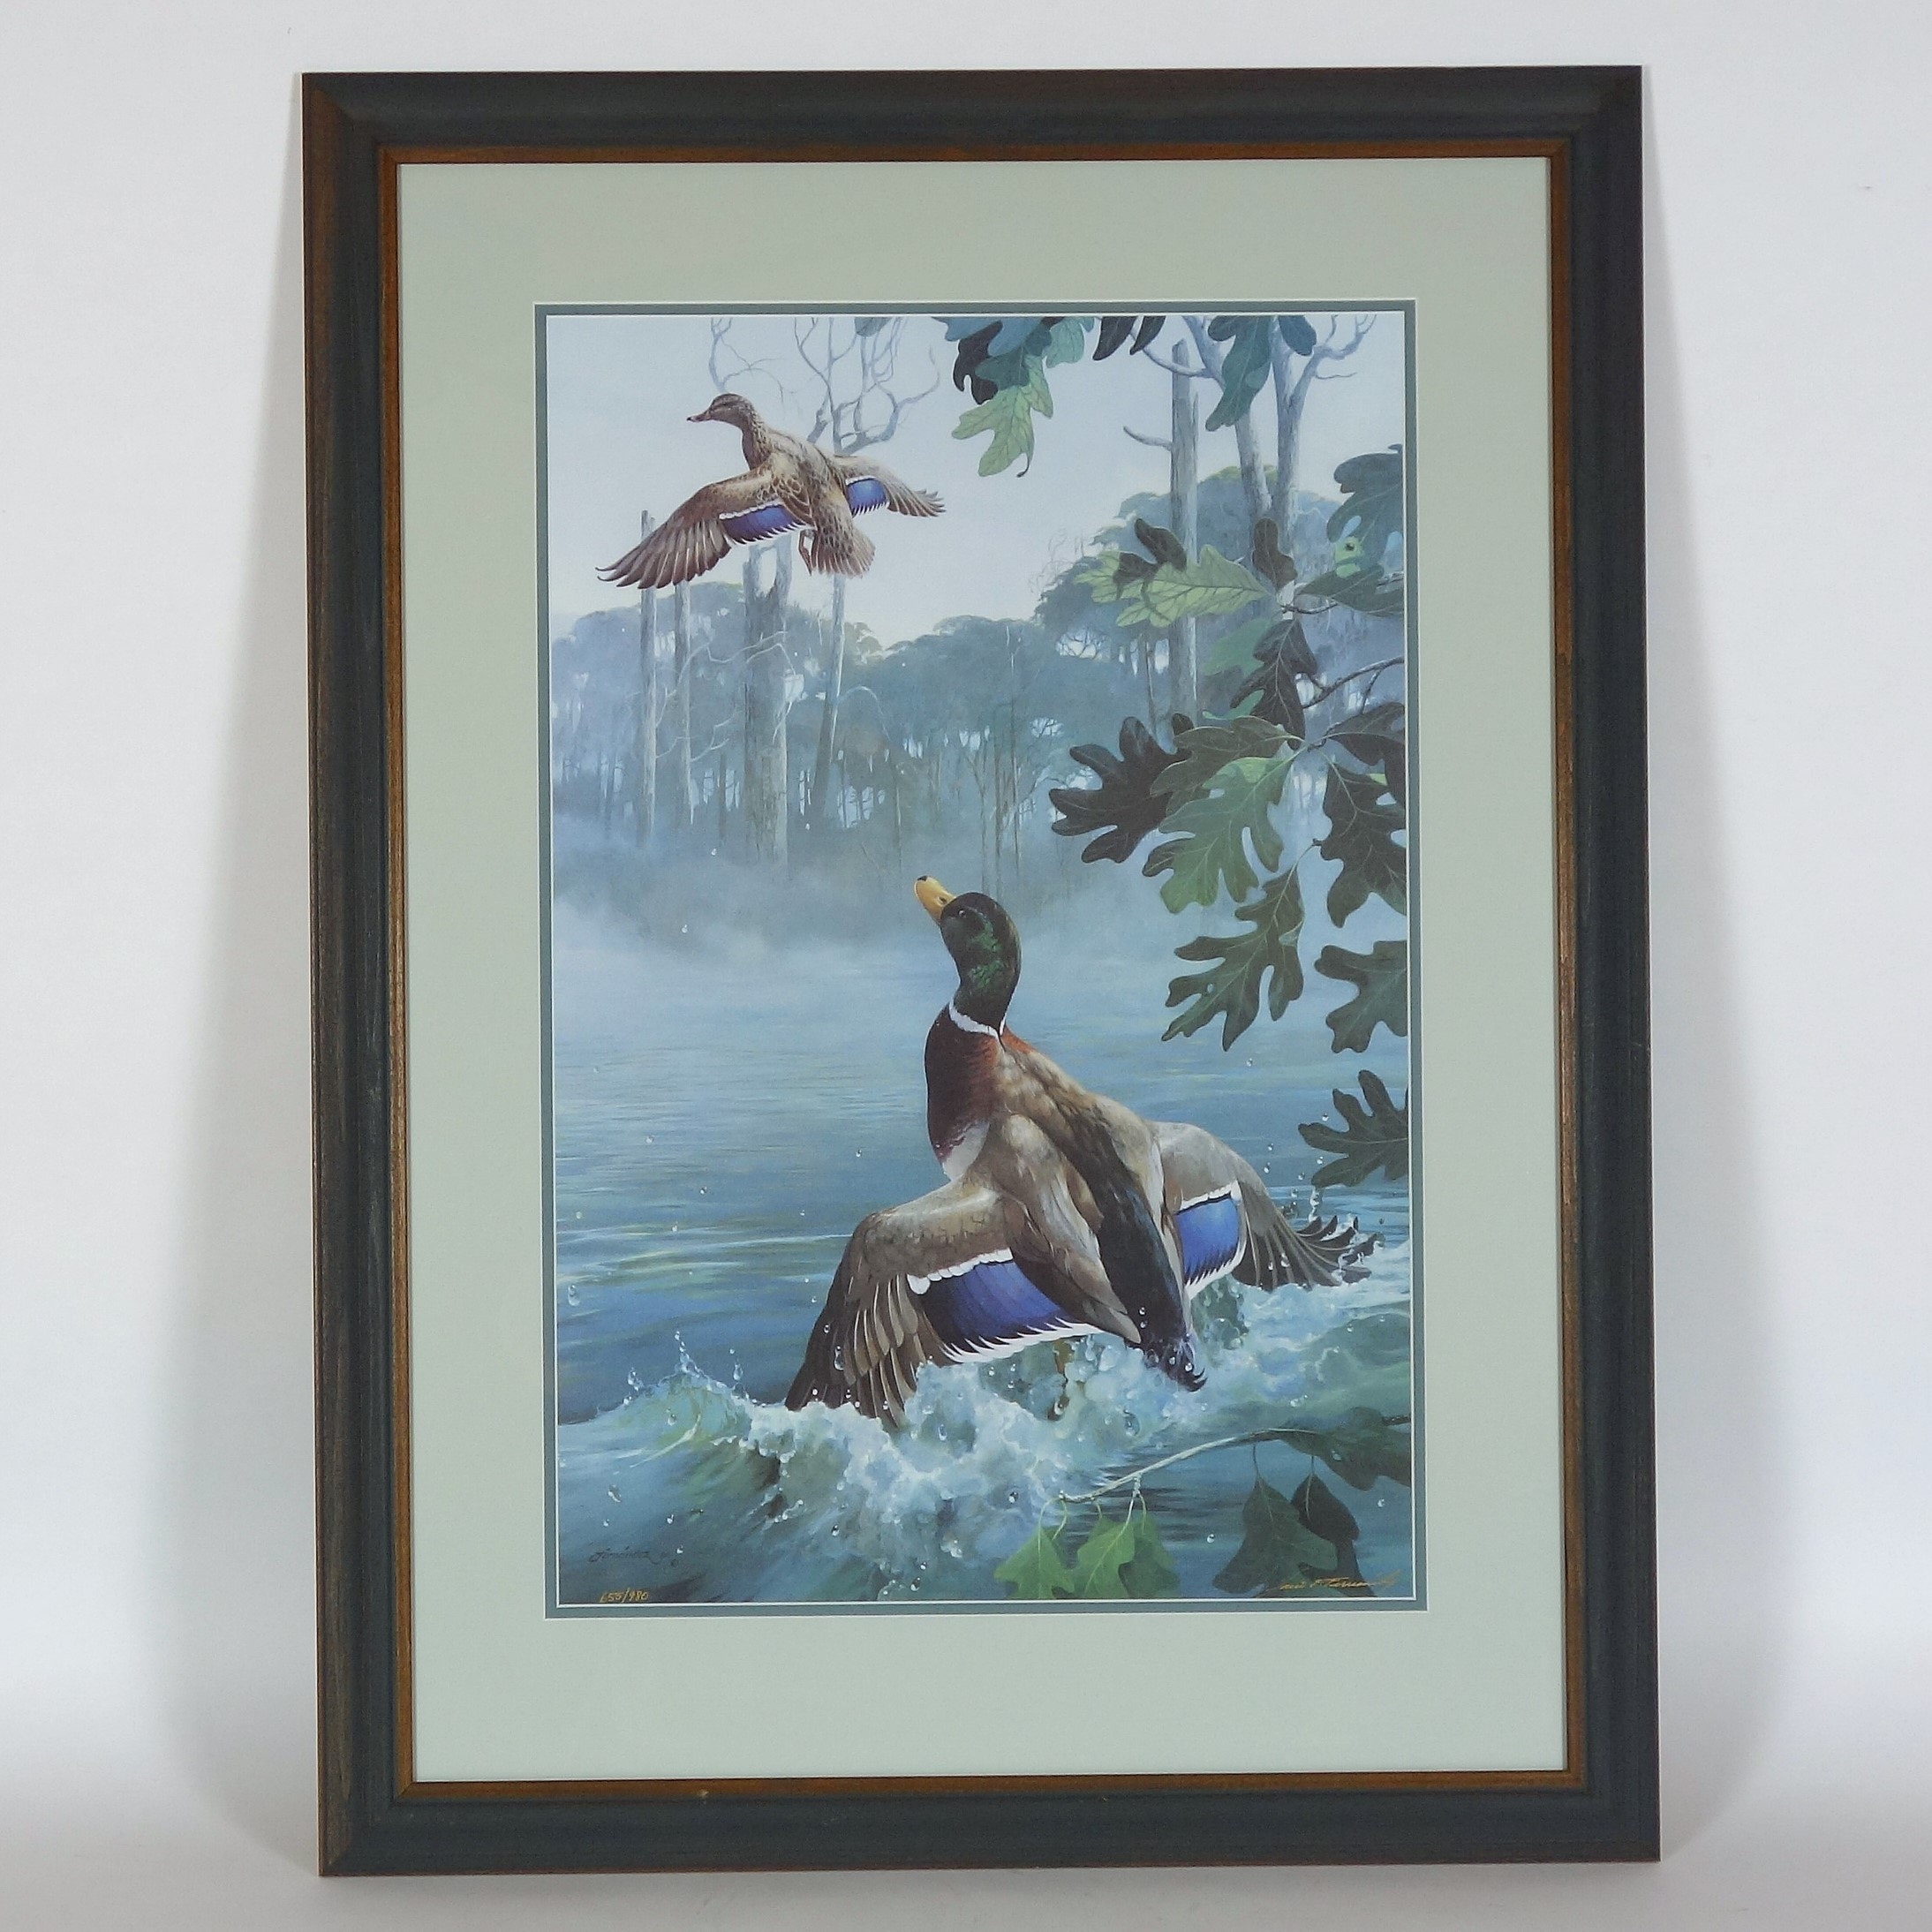 Offset Lithograph Print by Mario Fernandez